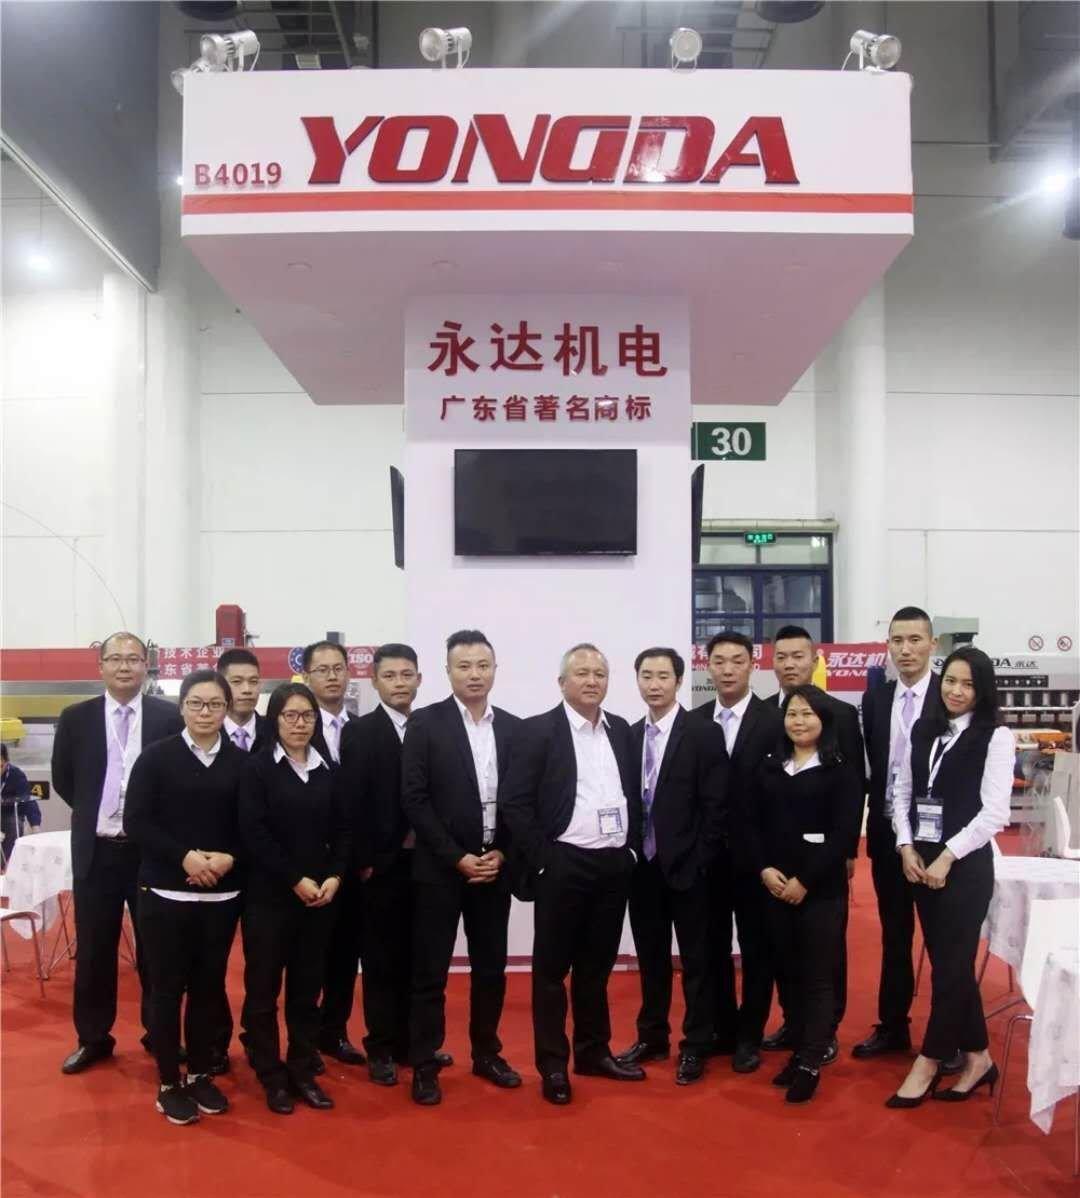 YONGDA-Yongda water jet faster cutting speed, higher return on investment-7